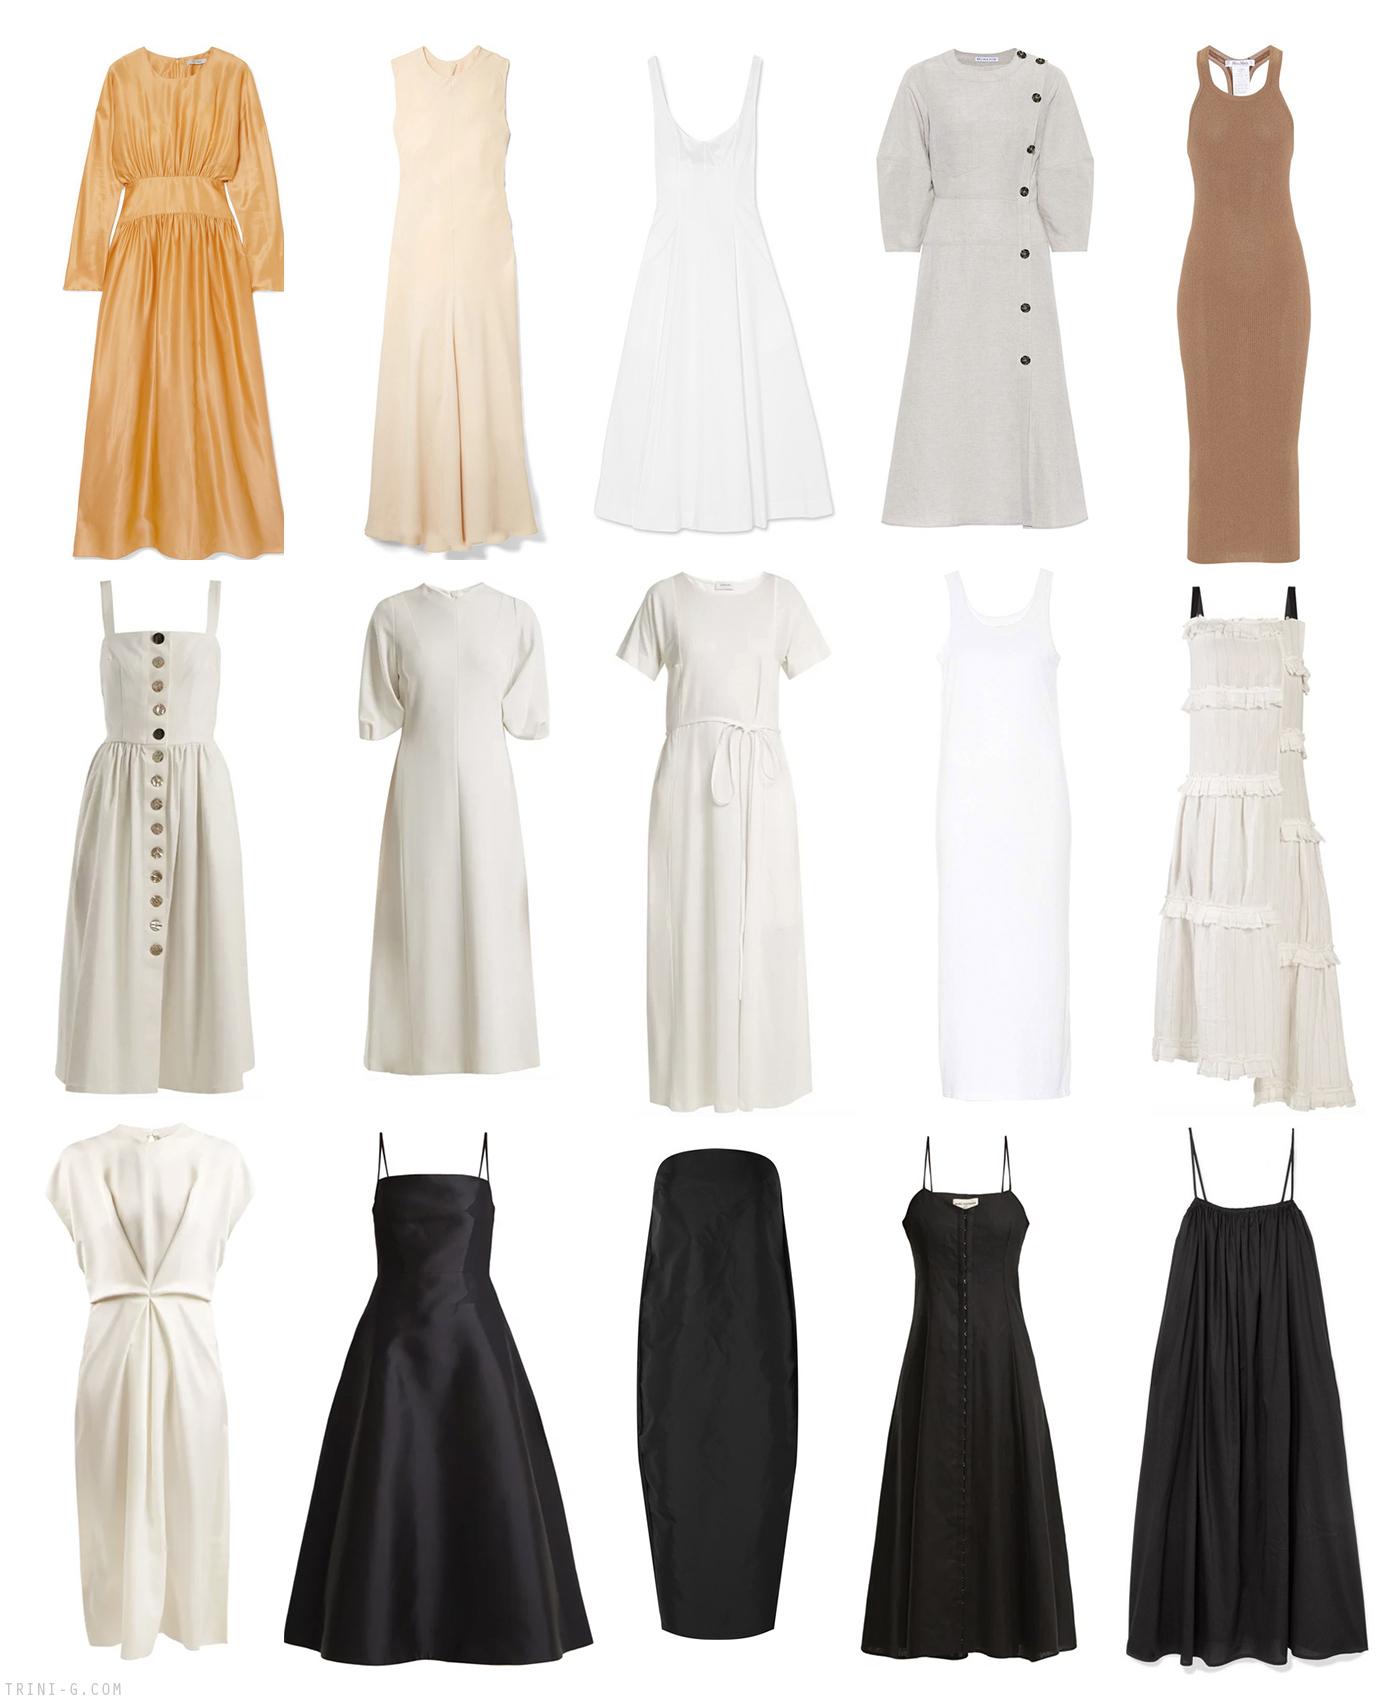 Trini | Spring Summer 2018 dresses